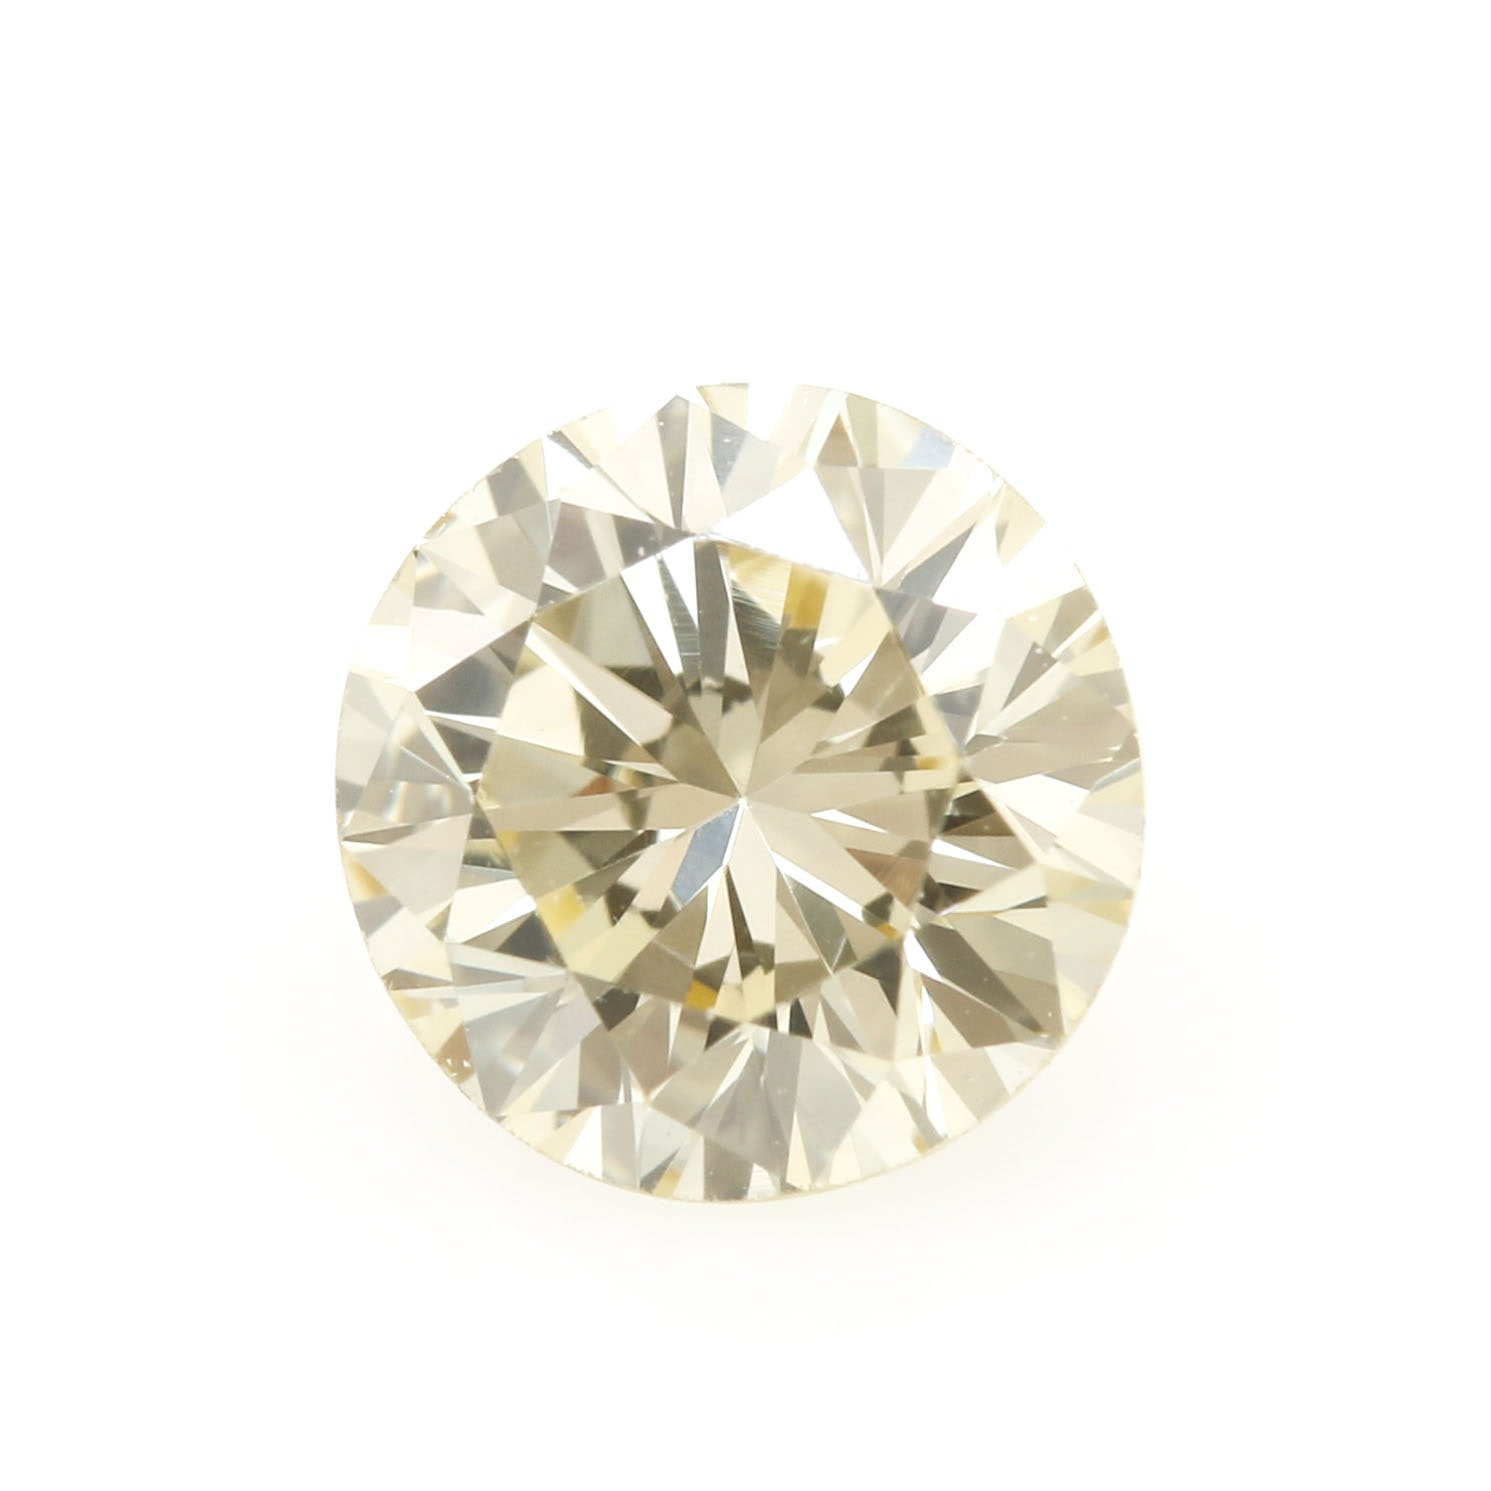 0.46 CT Loose Light Yellow Diamond Stone